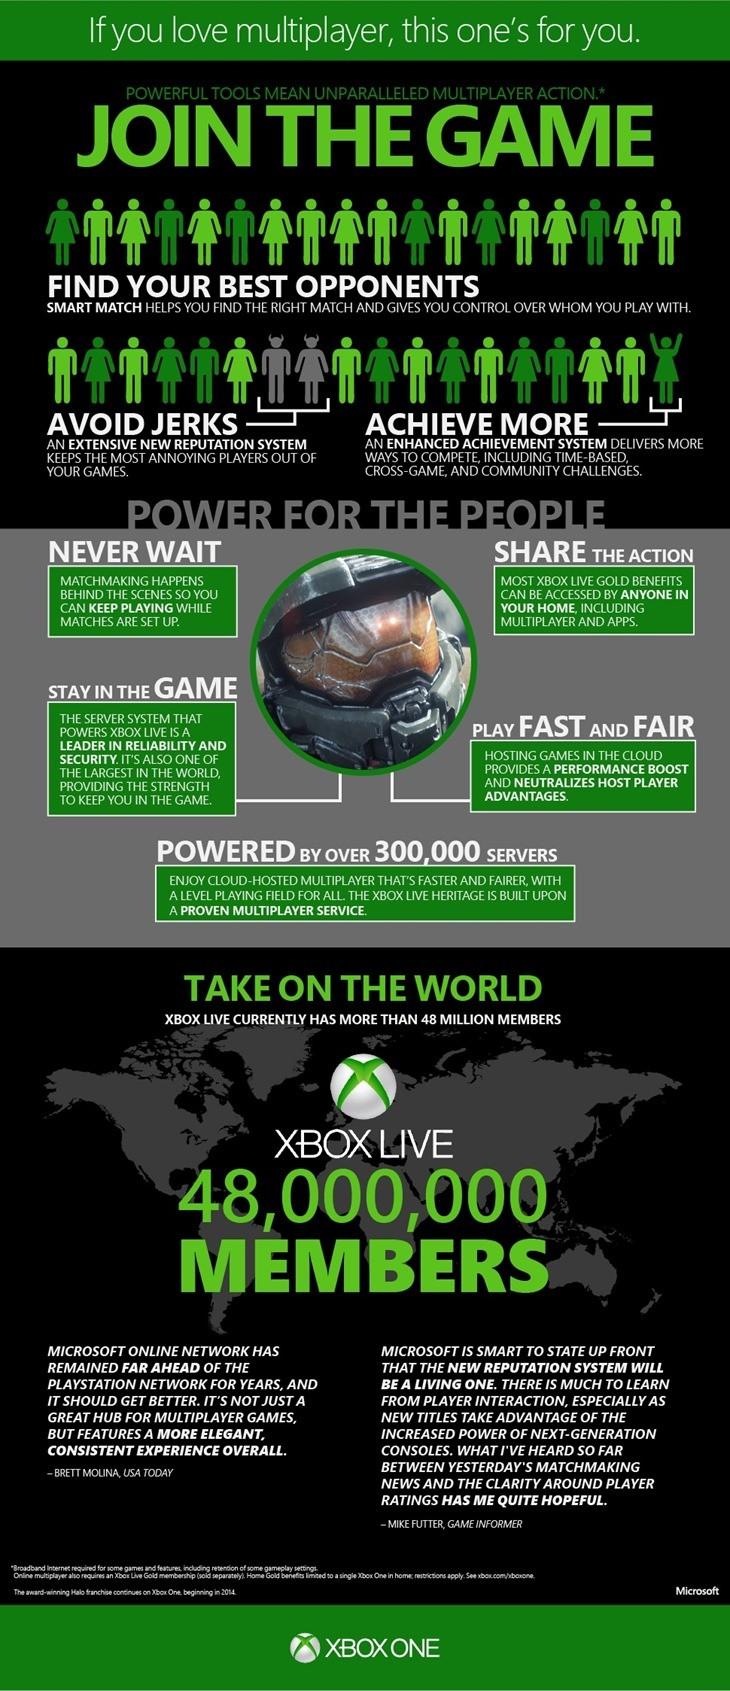 XboxOne_multiplayer_r7t3_ml (1)